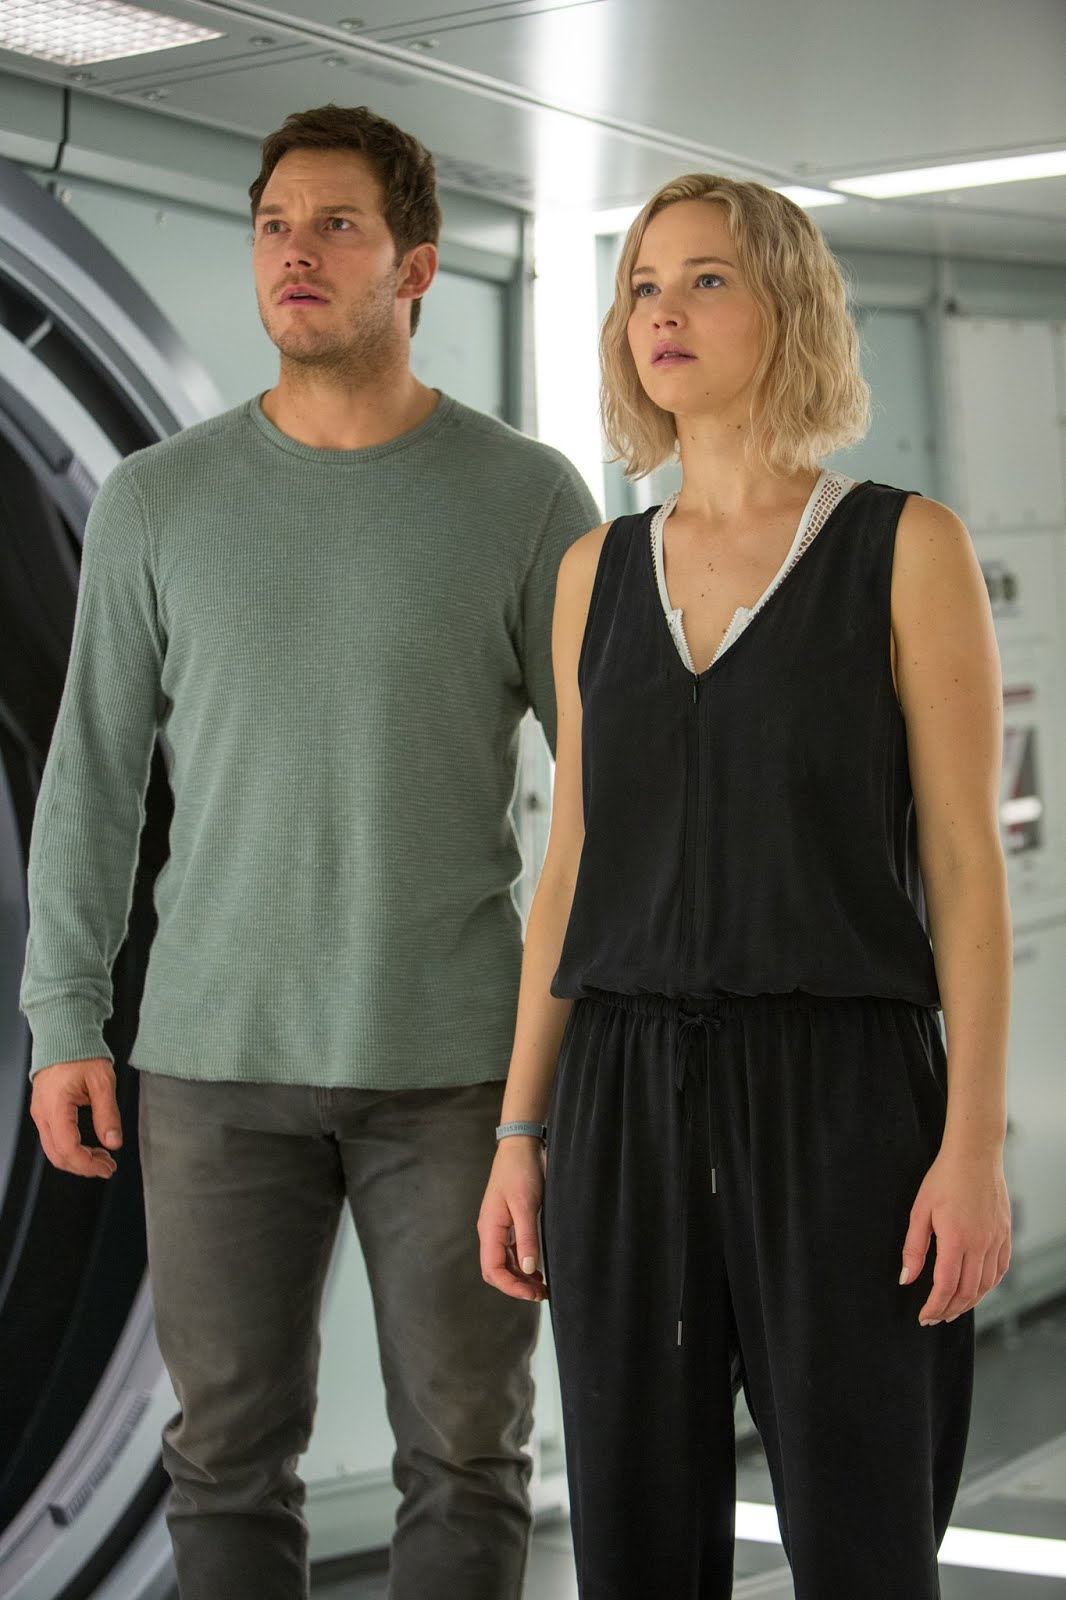 Jennifer Lawrence y Chris Pratt en Passengers (Pasajeros ...